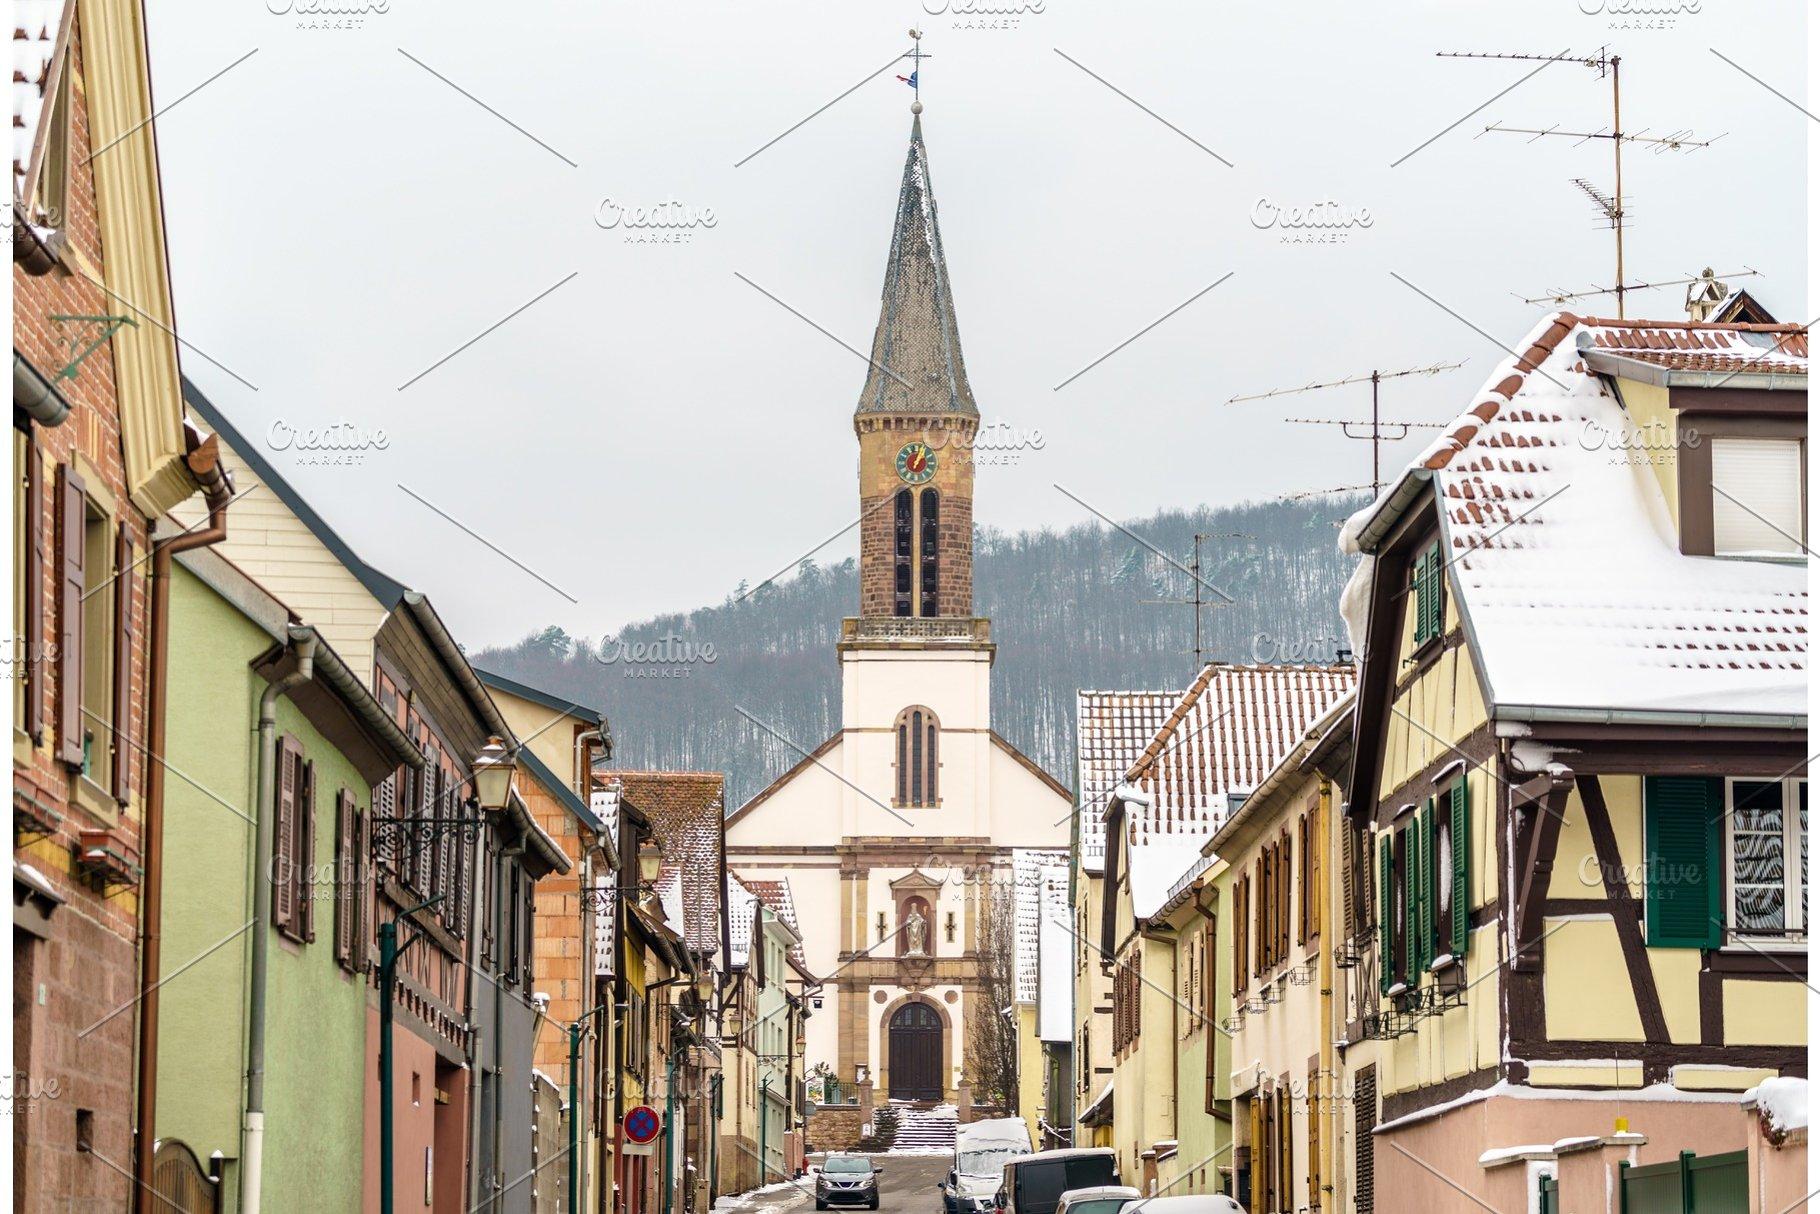 Architecte Bas Rhin saint matrin church in kintzheim, a village in bas-rhin - alsace, france